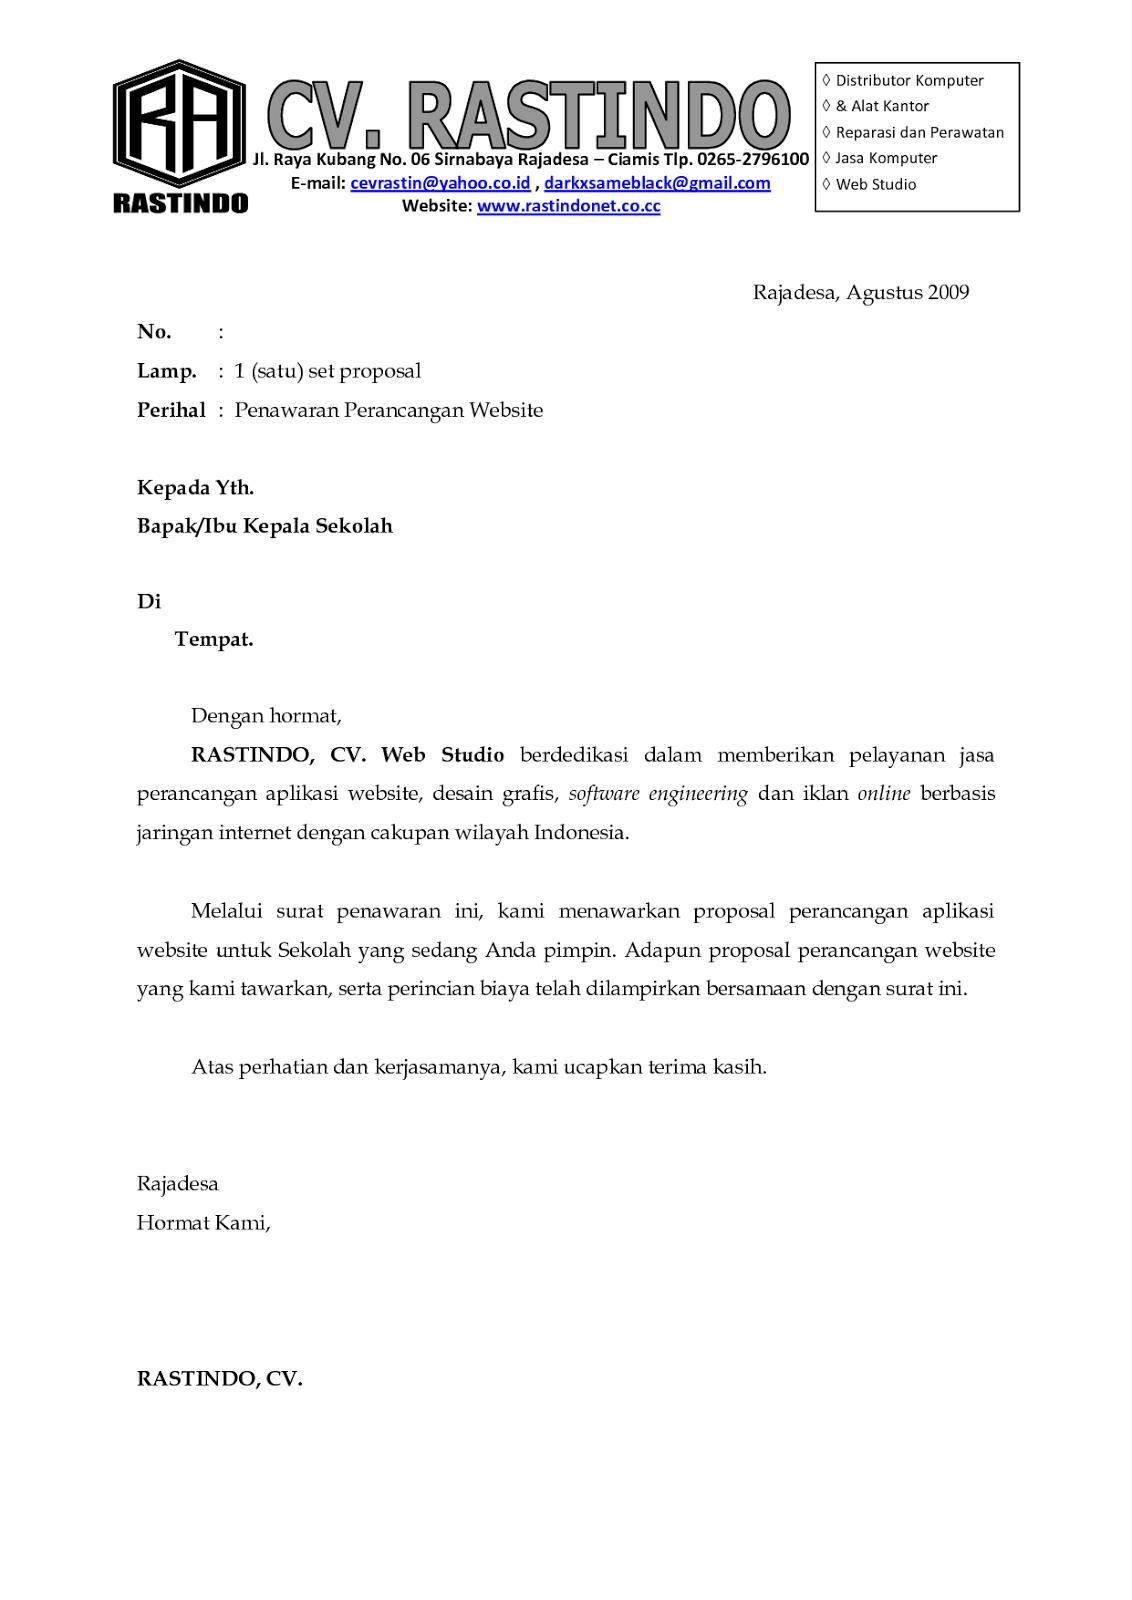 contoh application letter akuntansi